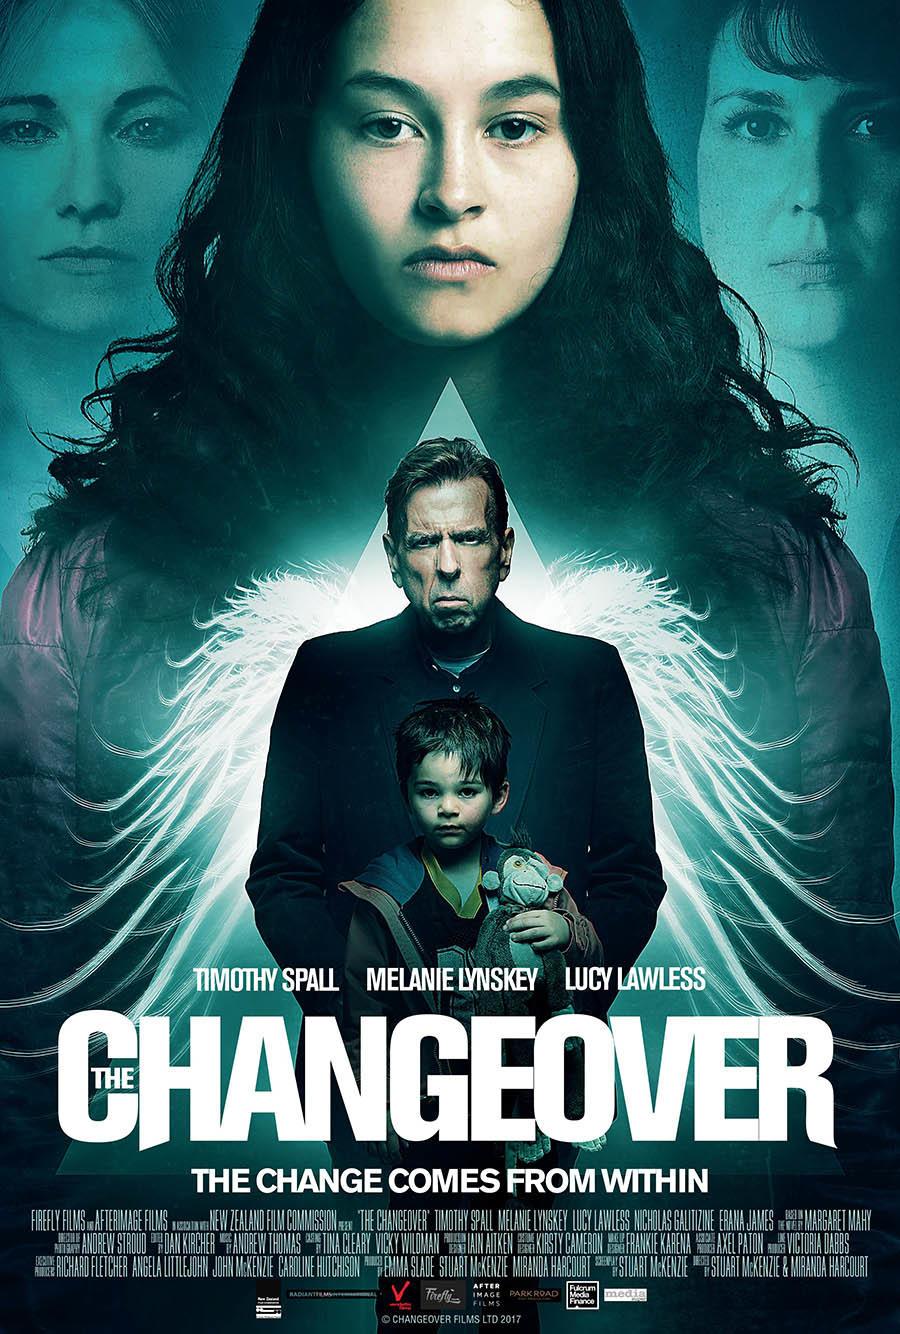 Angela Nicholas Movies the changeover | fandango